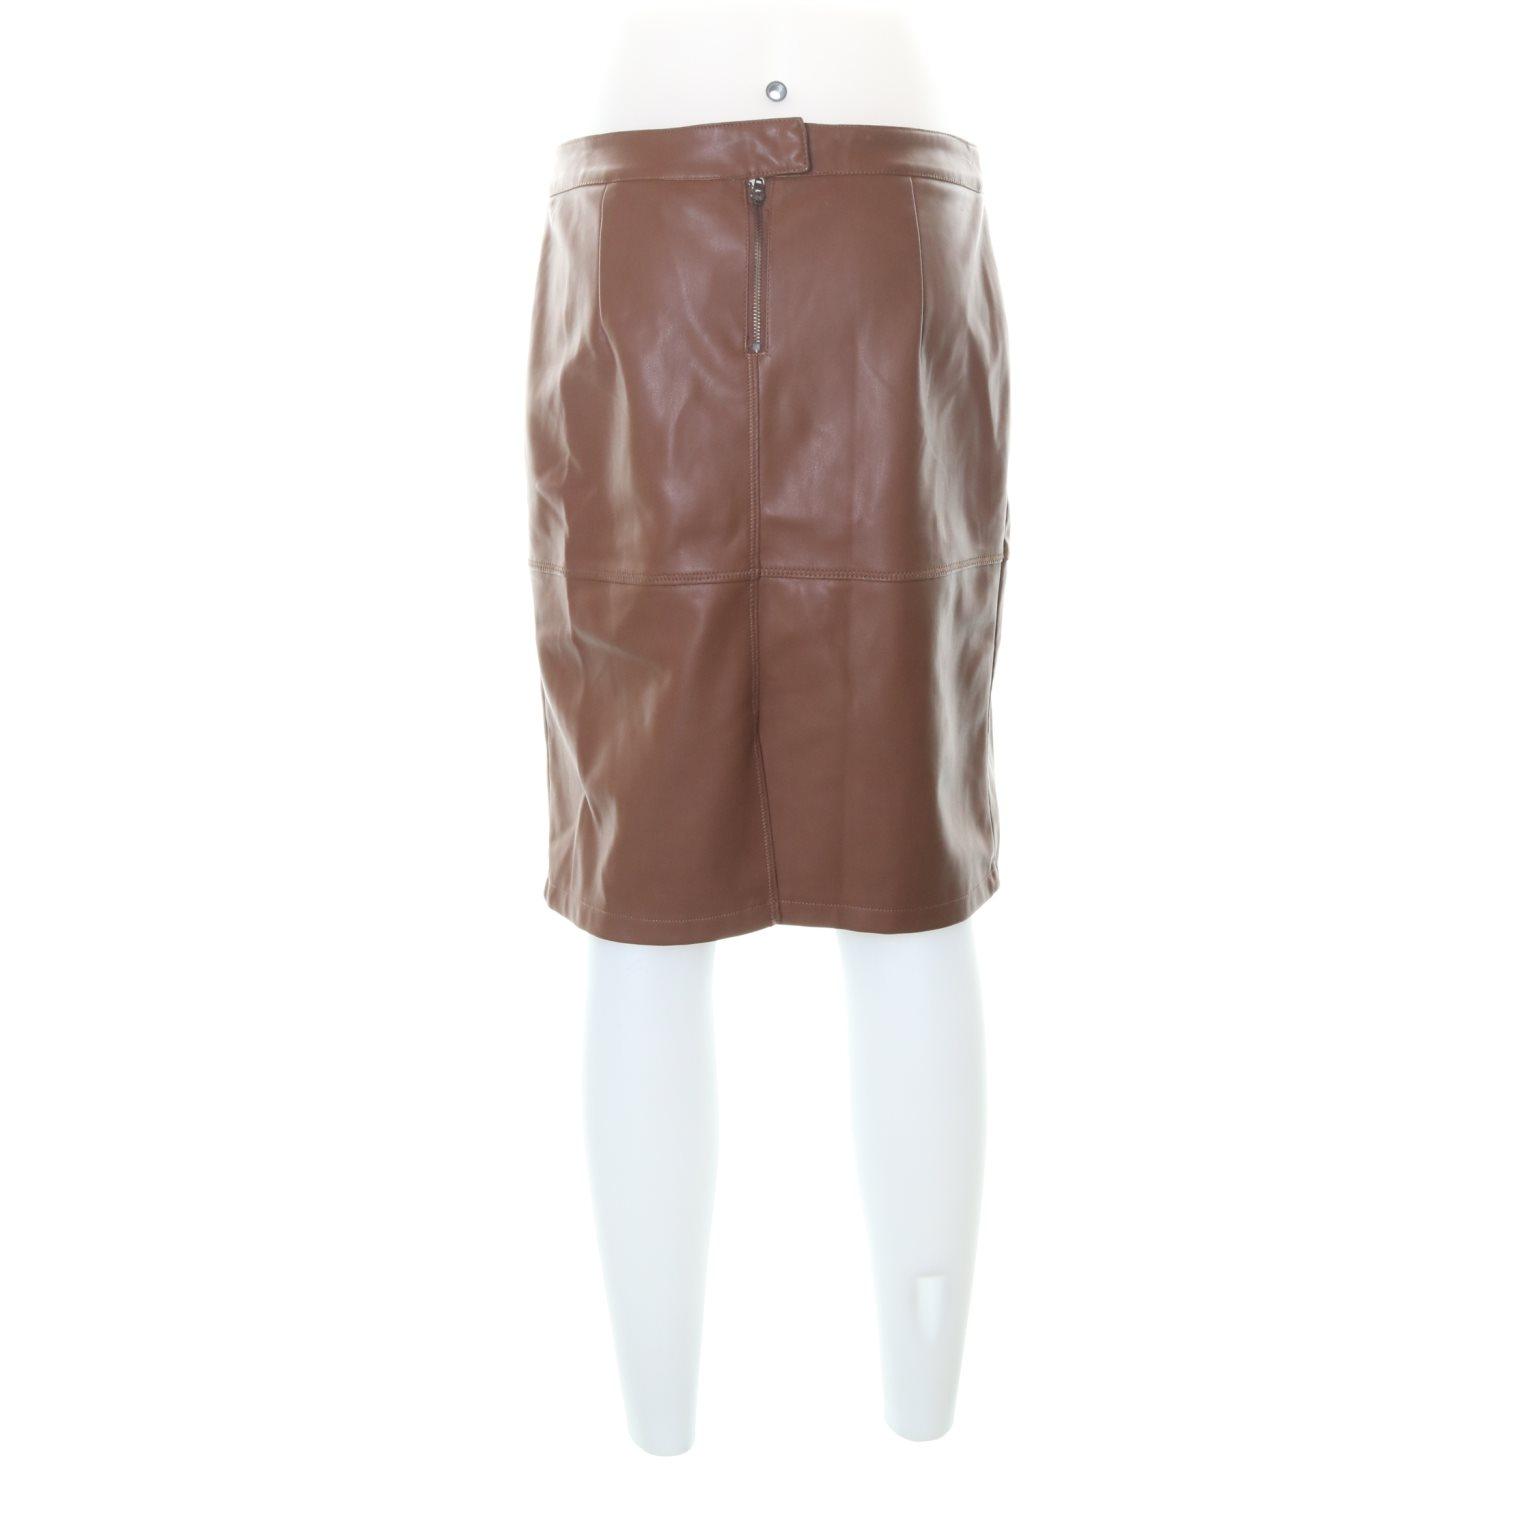 Vila Clothes, Skinnkjol, Strl: Strl: Strl: L, Brun 9edf20